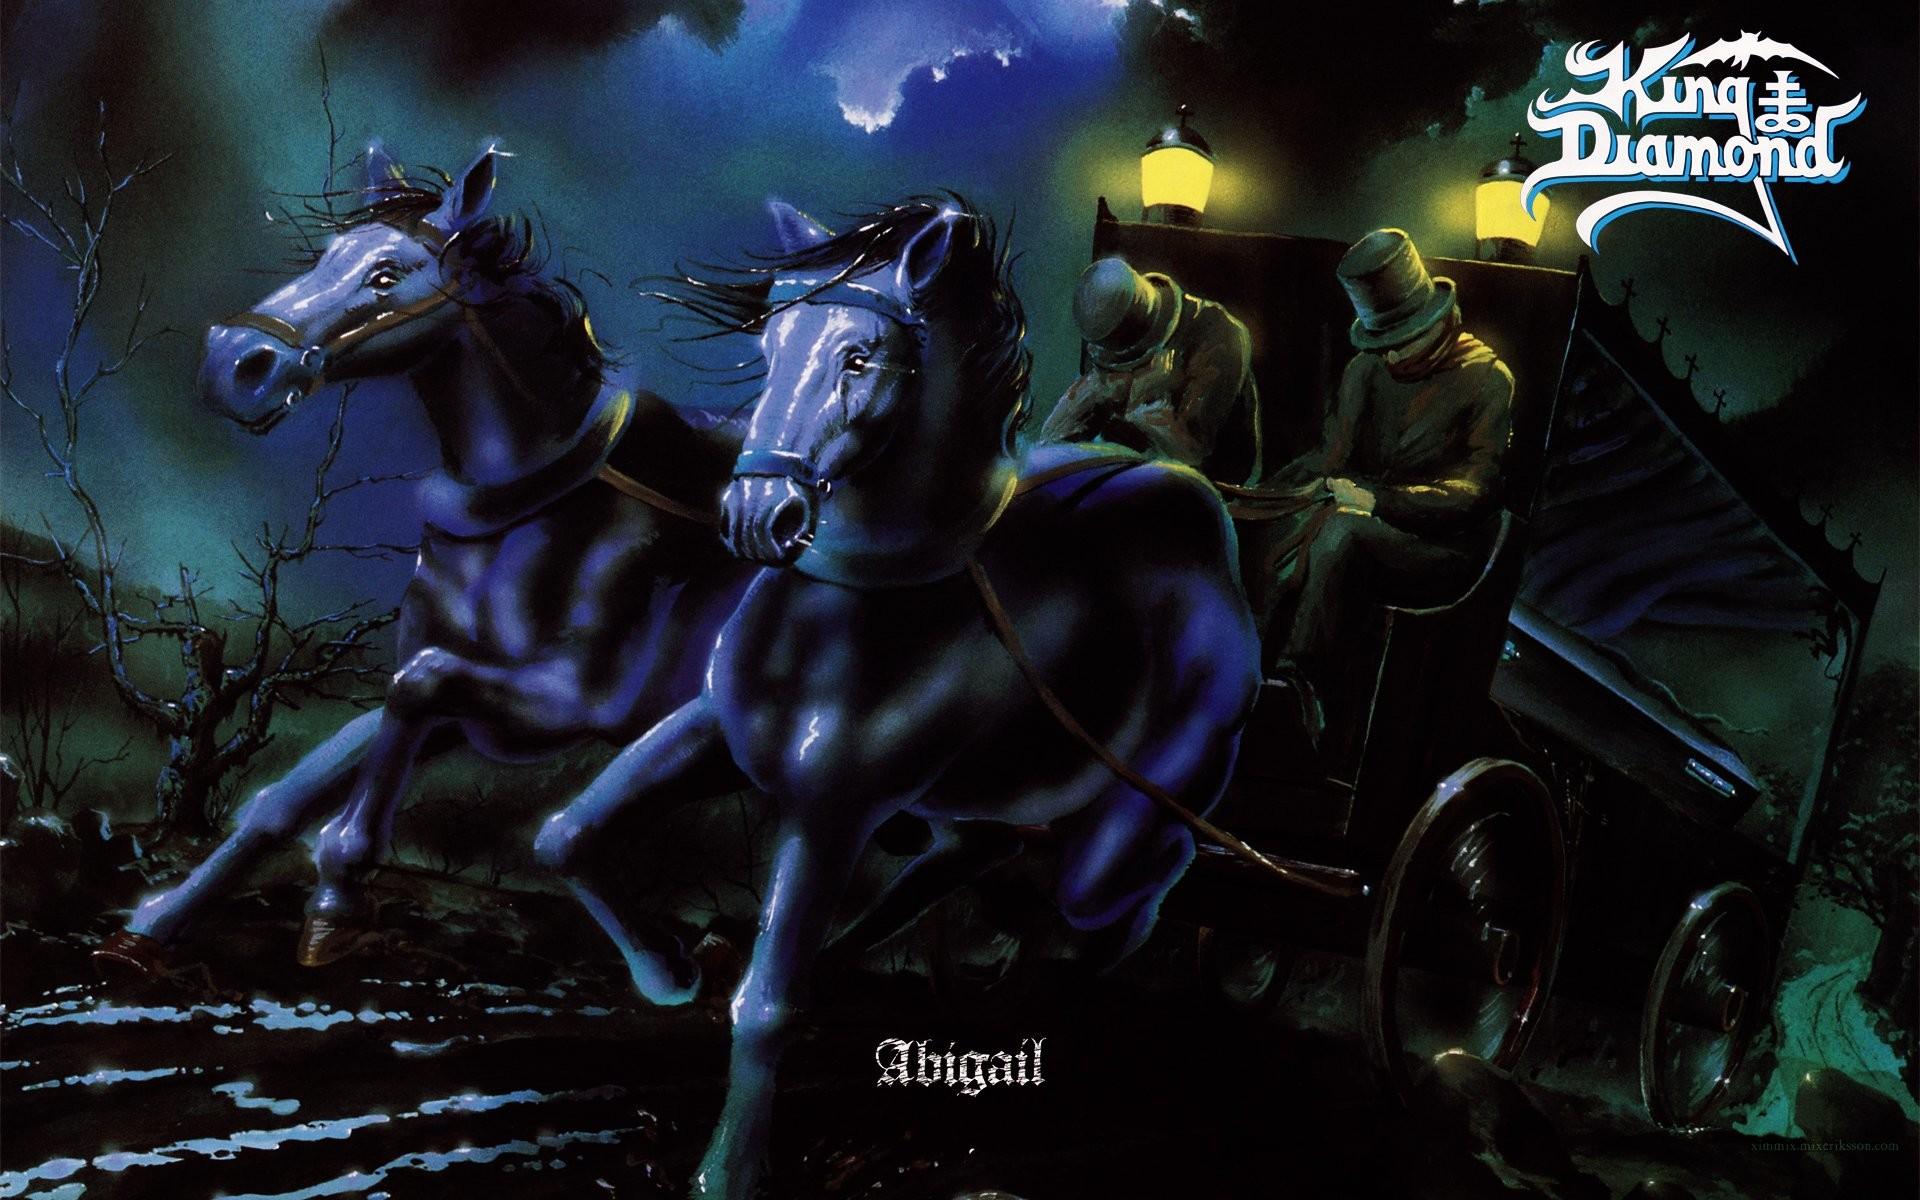 Res: 1920x1200, Music - King Diamond Heavy Metal Metal Hard Rock Album Cover Wallpaper